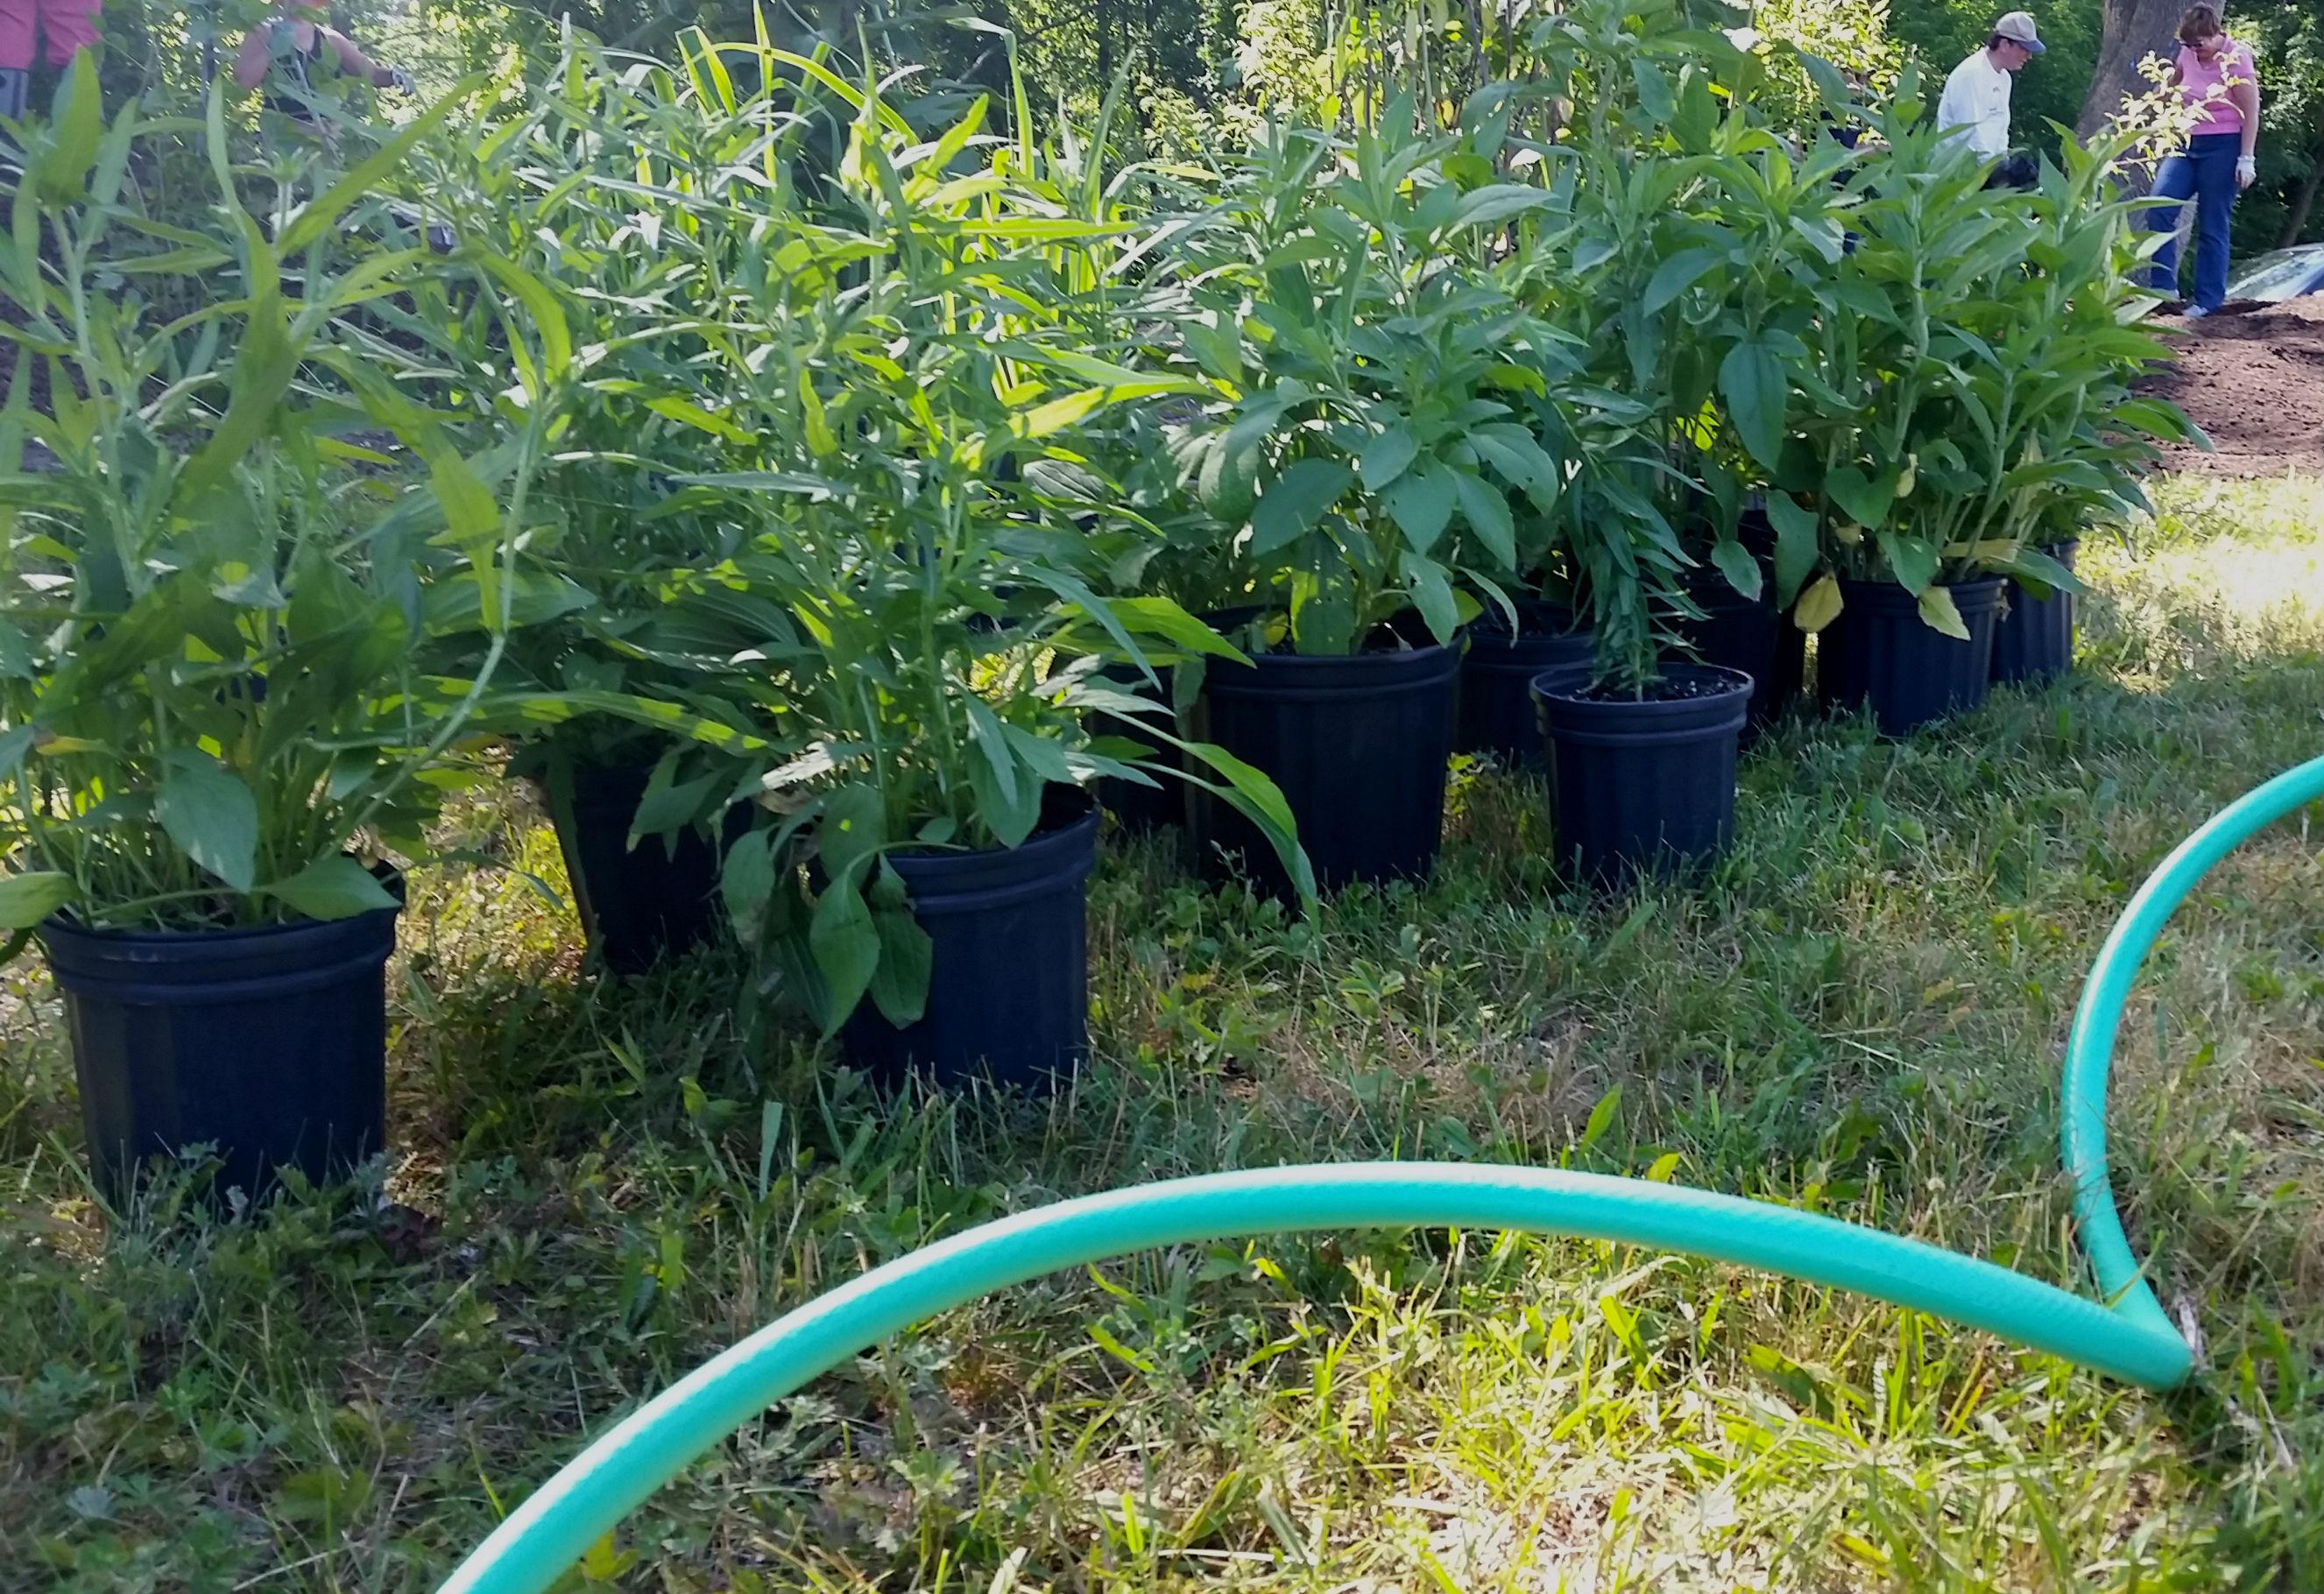 b3a35a289d58a4d5bf71_plants_waiting_setup.jpg